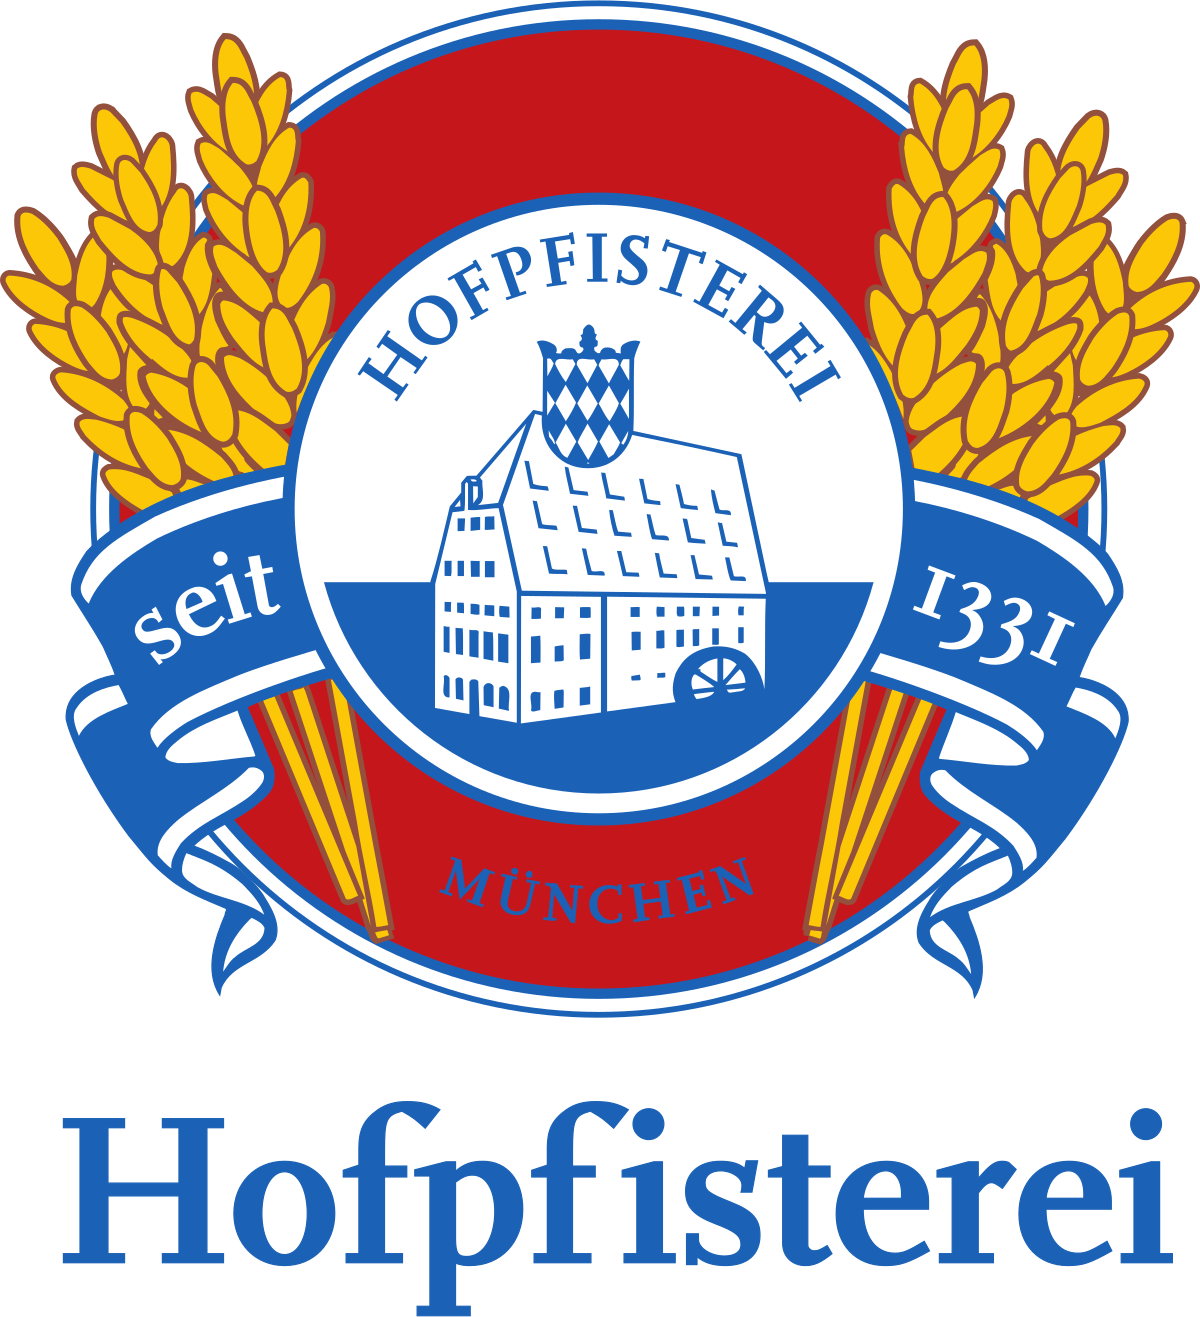 Ludwig Stocker Hofpfisterei GmbH, München